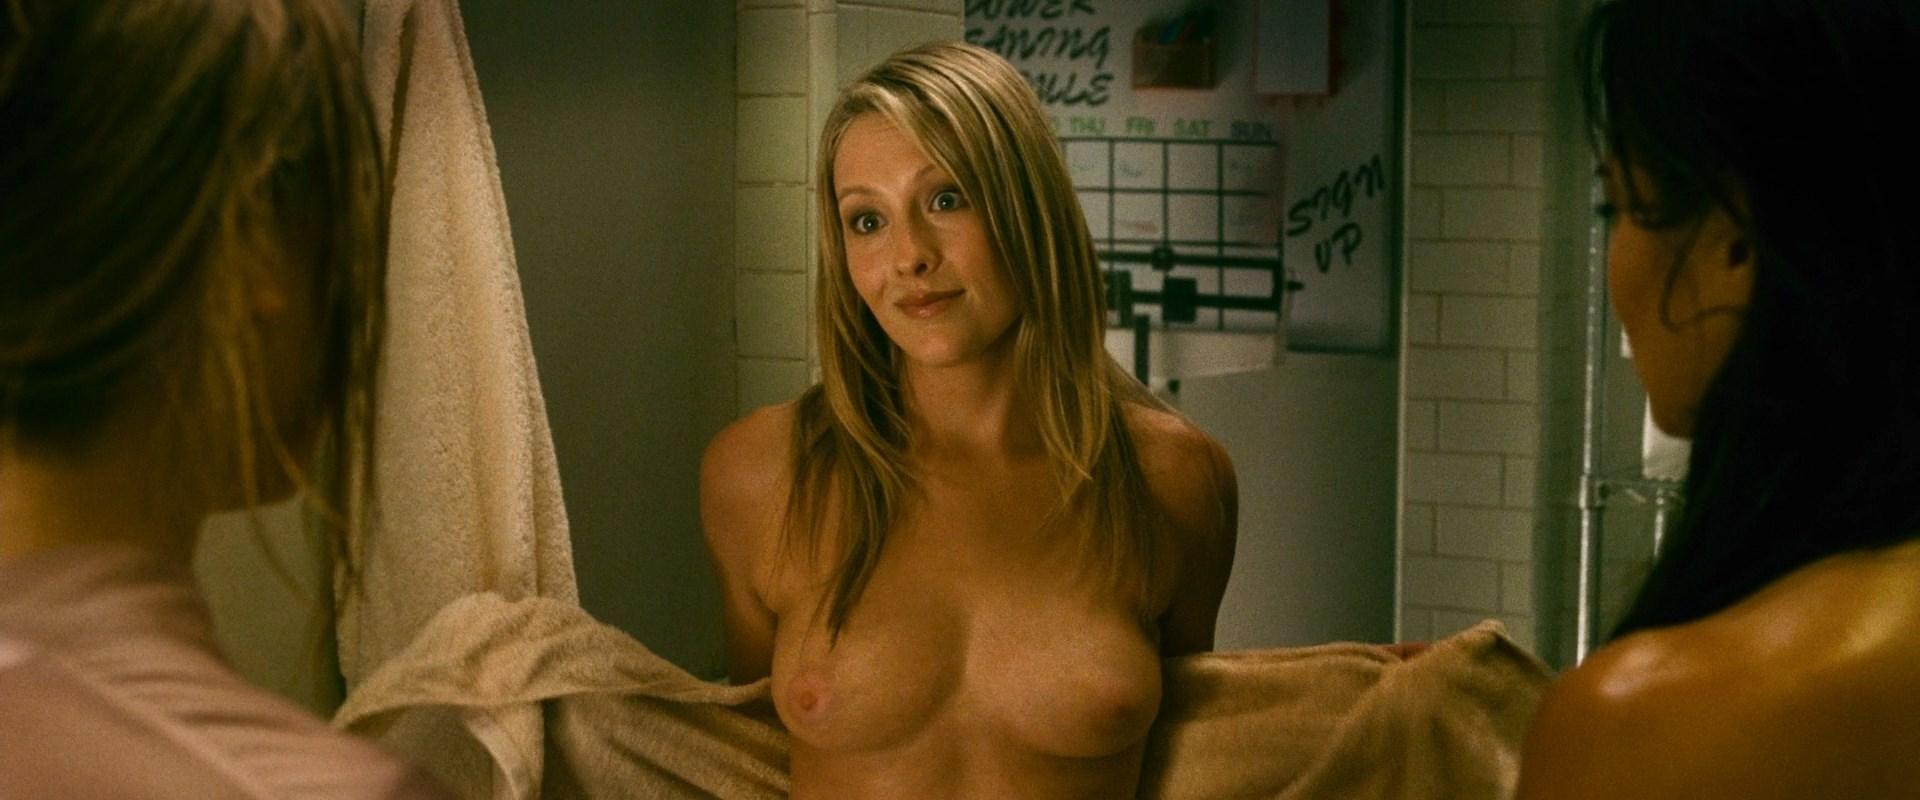 Sorority girls sexting nudes pics-9753